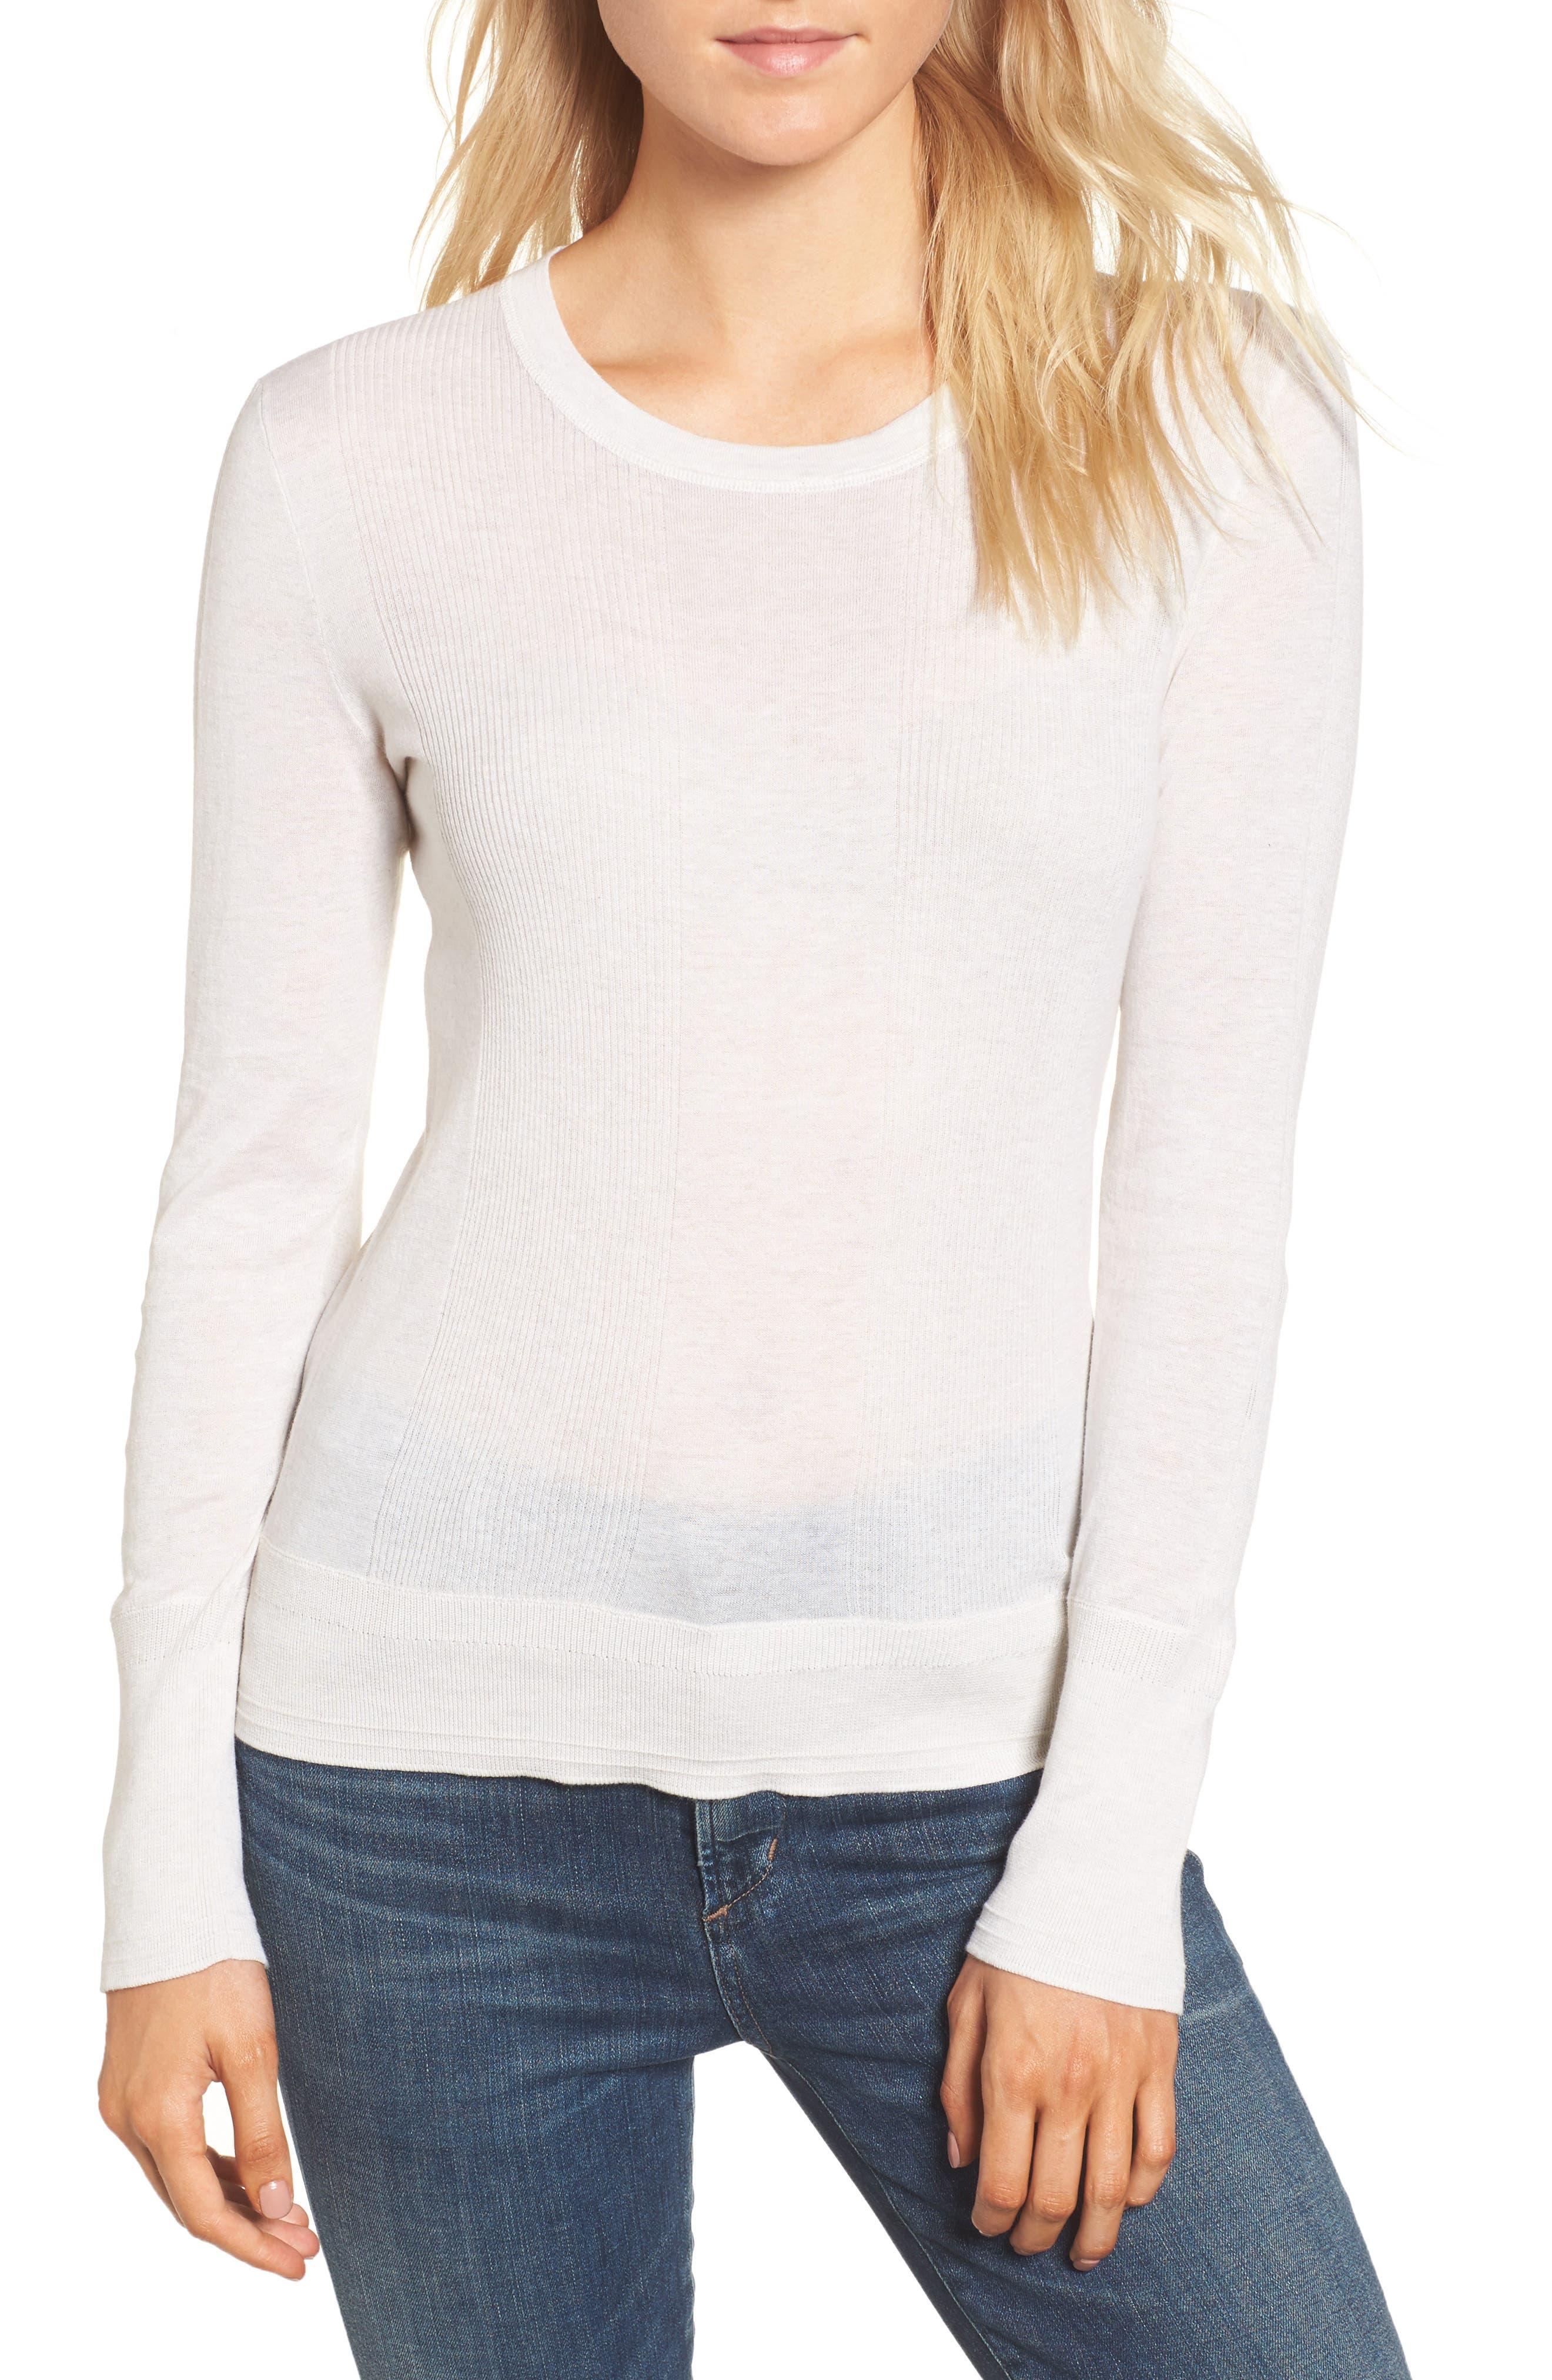 Main Image - James Perse Cotton Crewneck Sweater